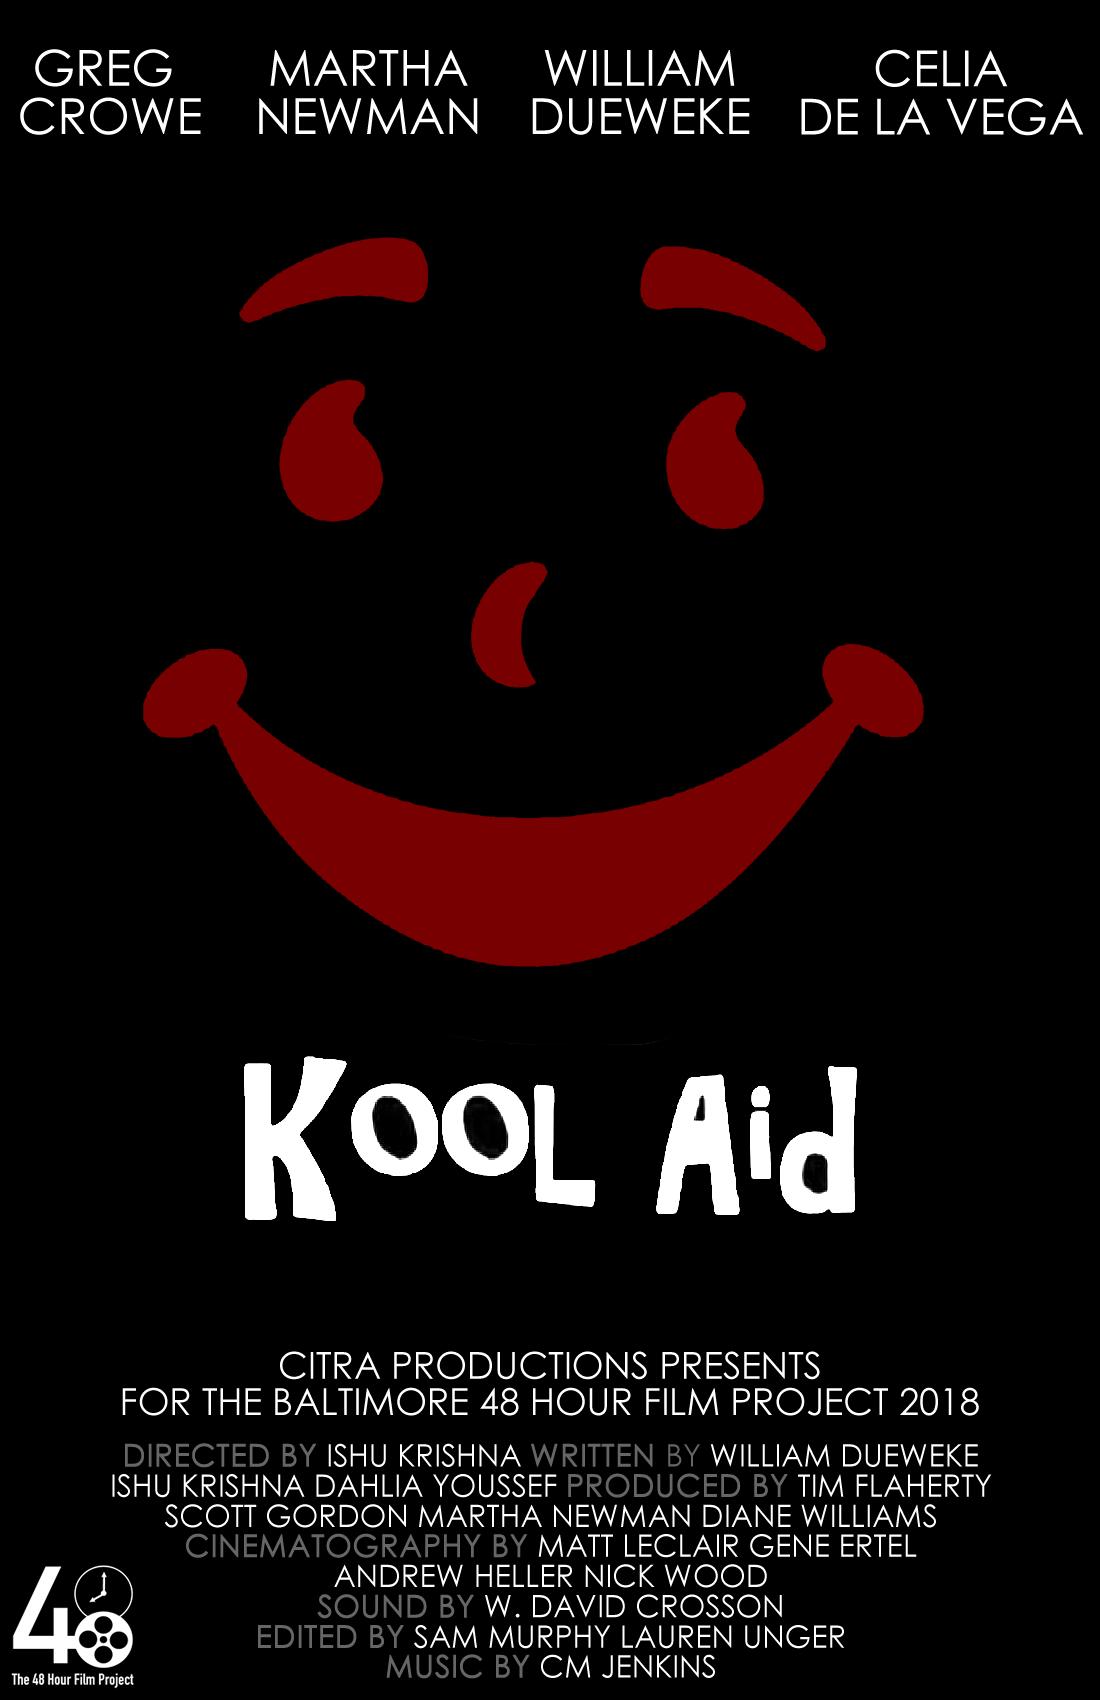 kool aid poster.jpg